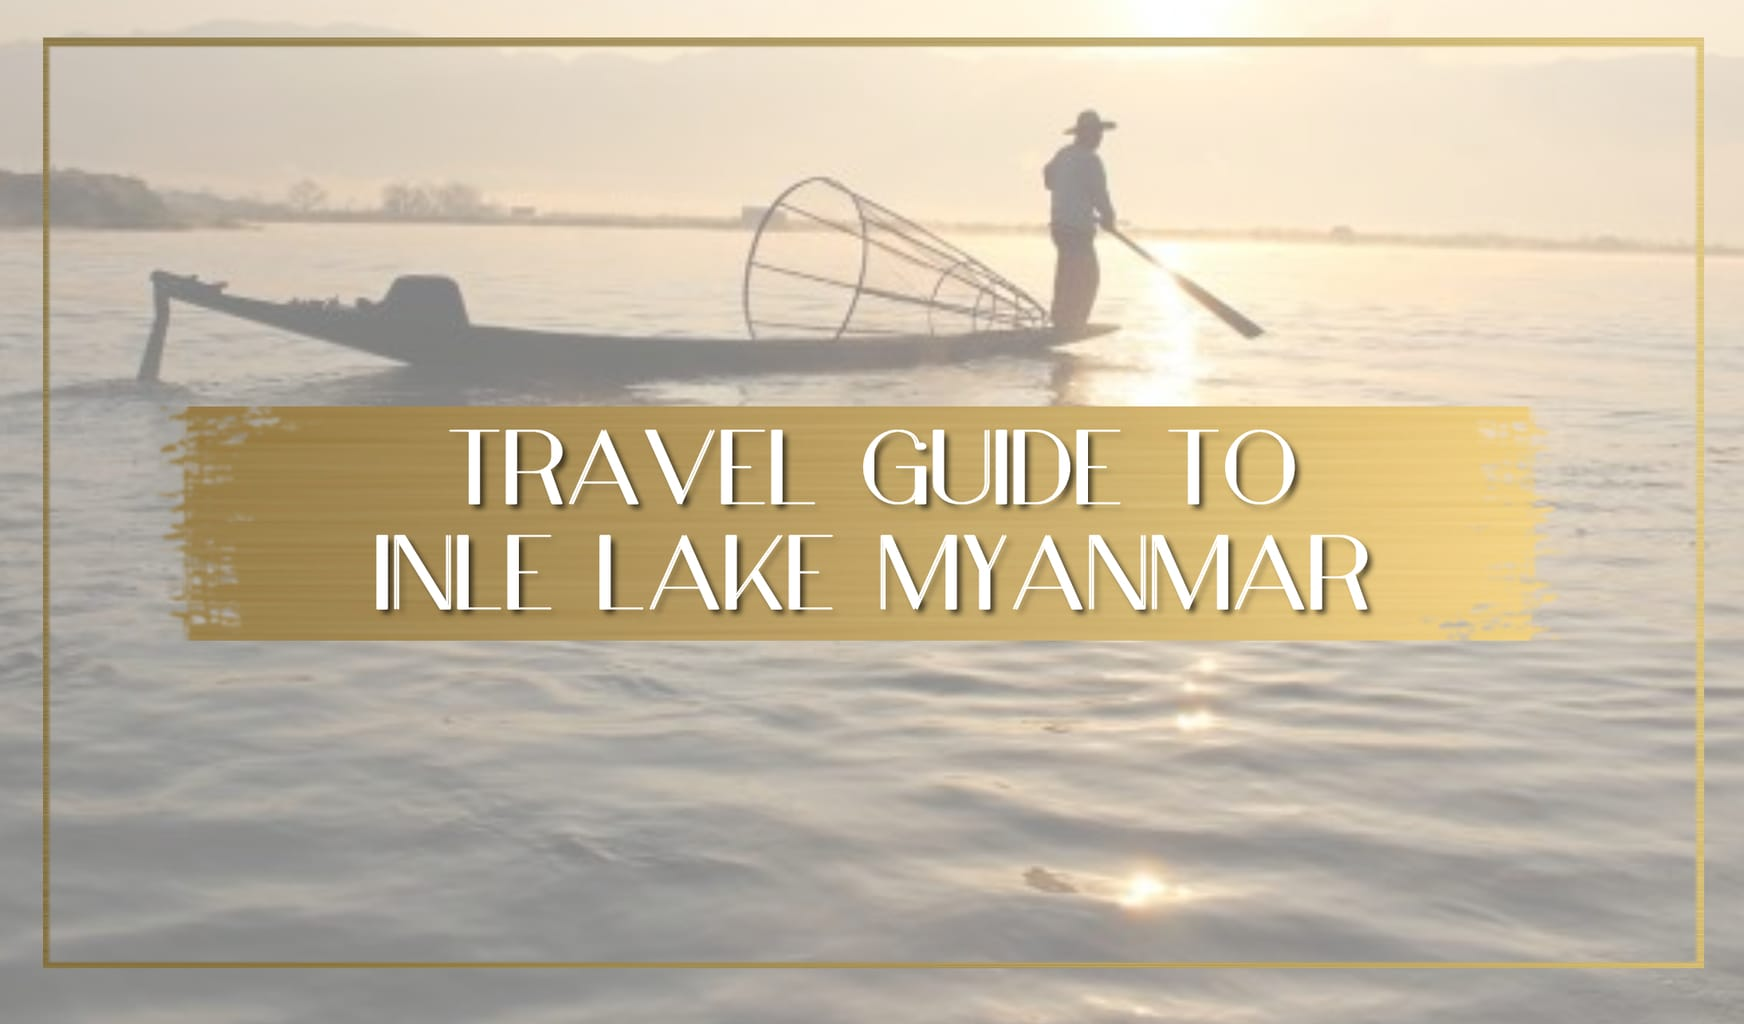 Travel guide to Inle Lake Myanmar main